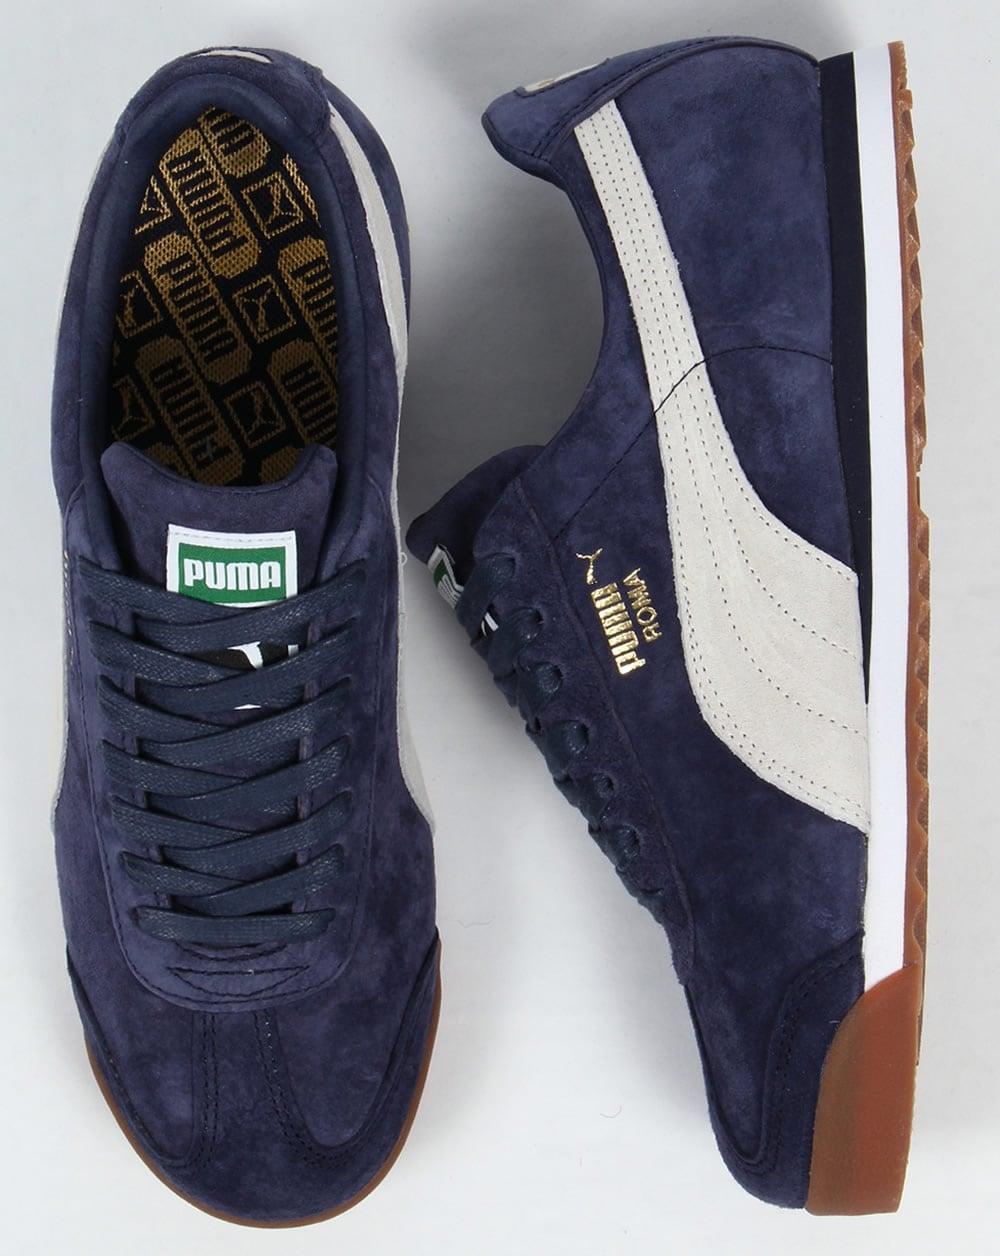 Pumas Roma Suède Bleu awsxol